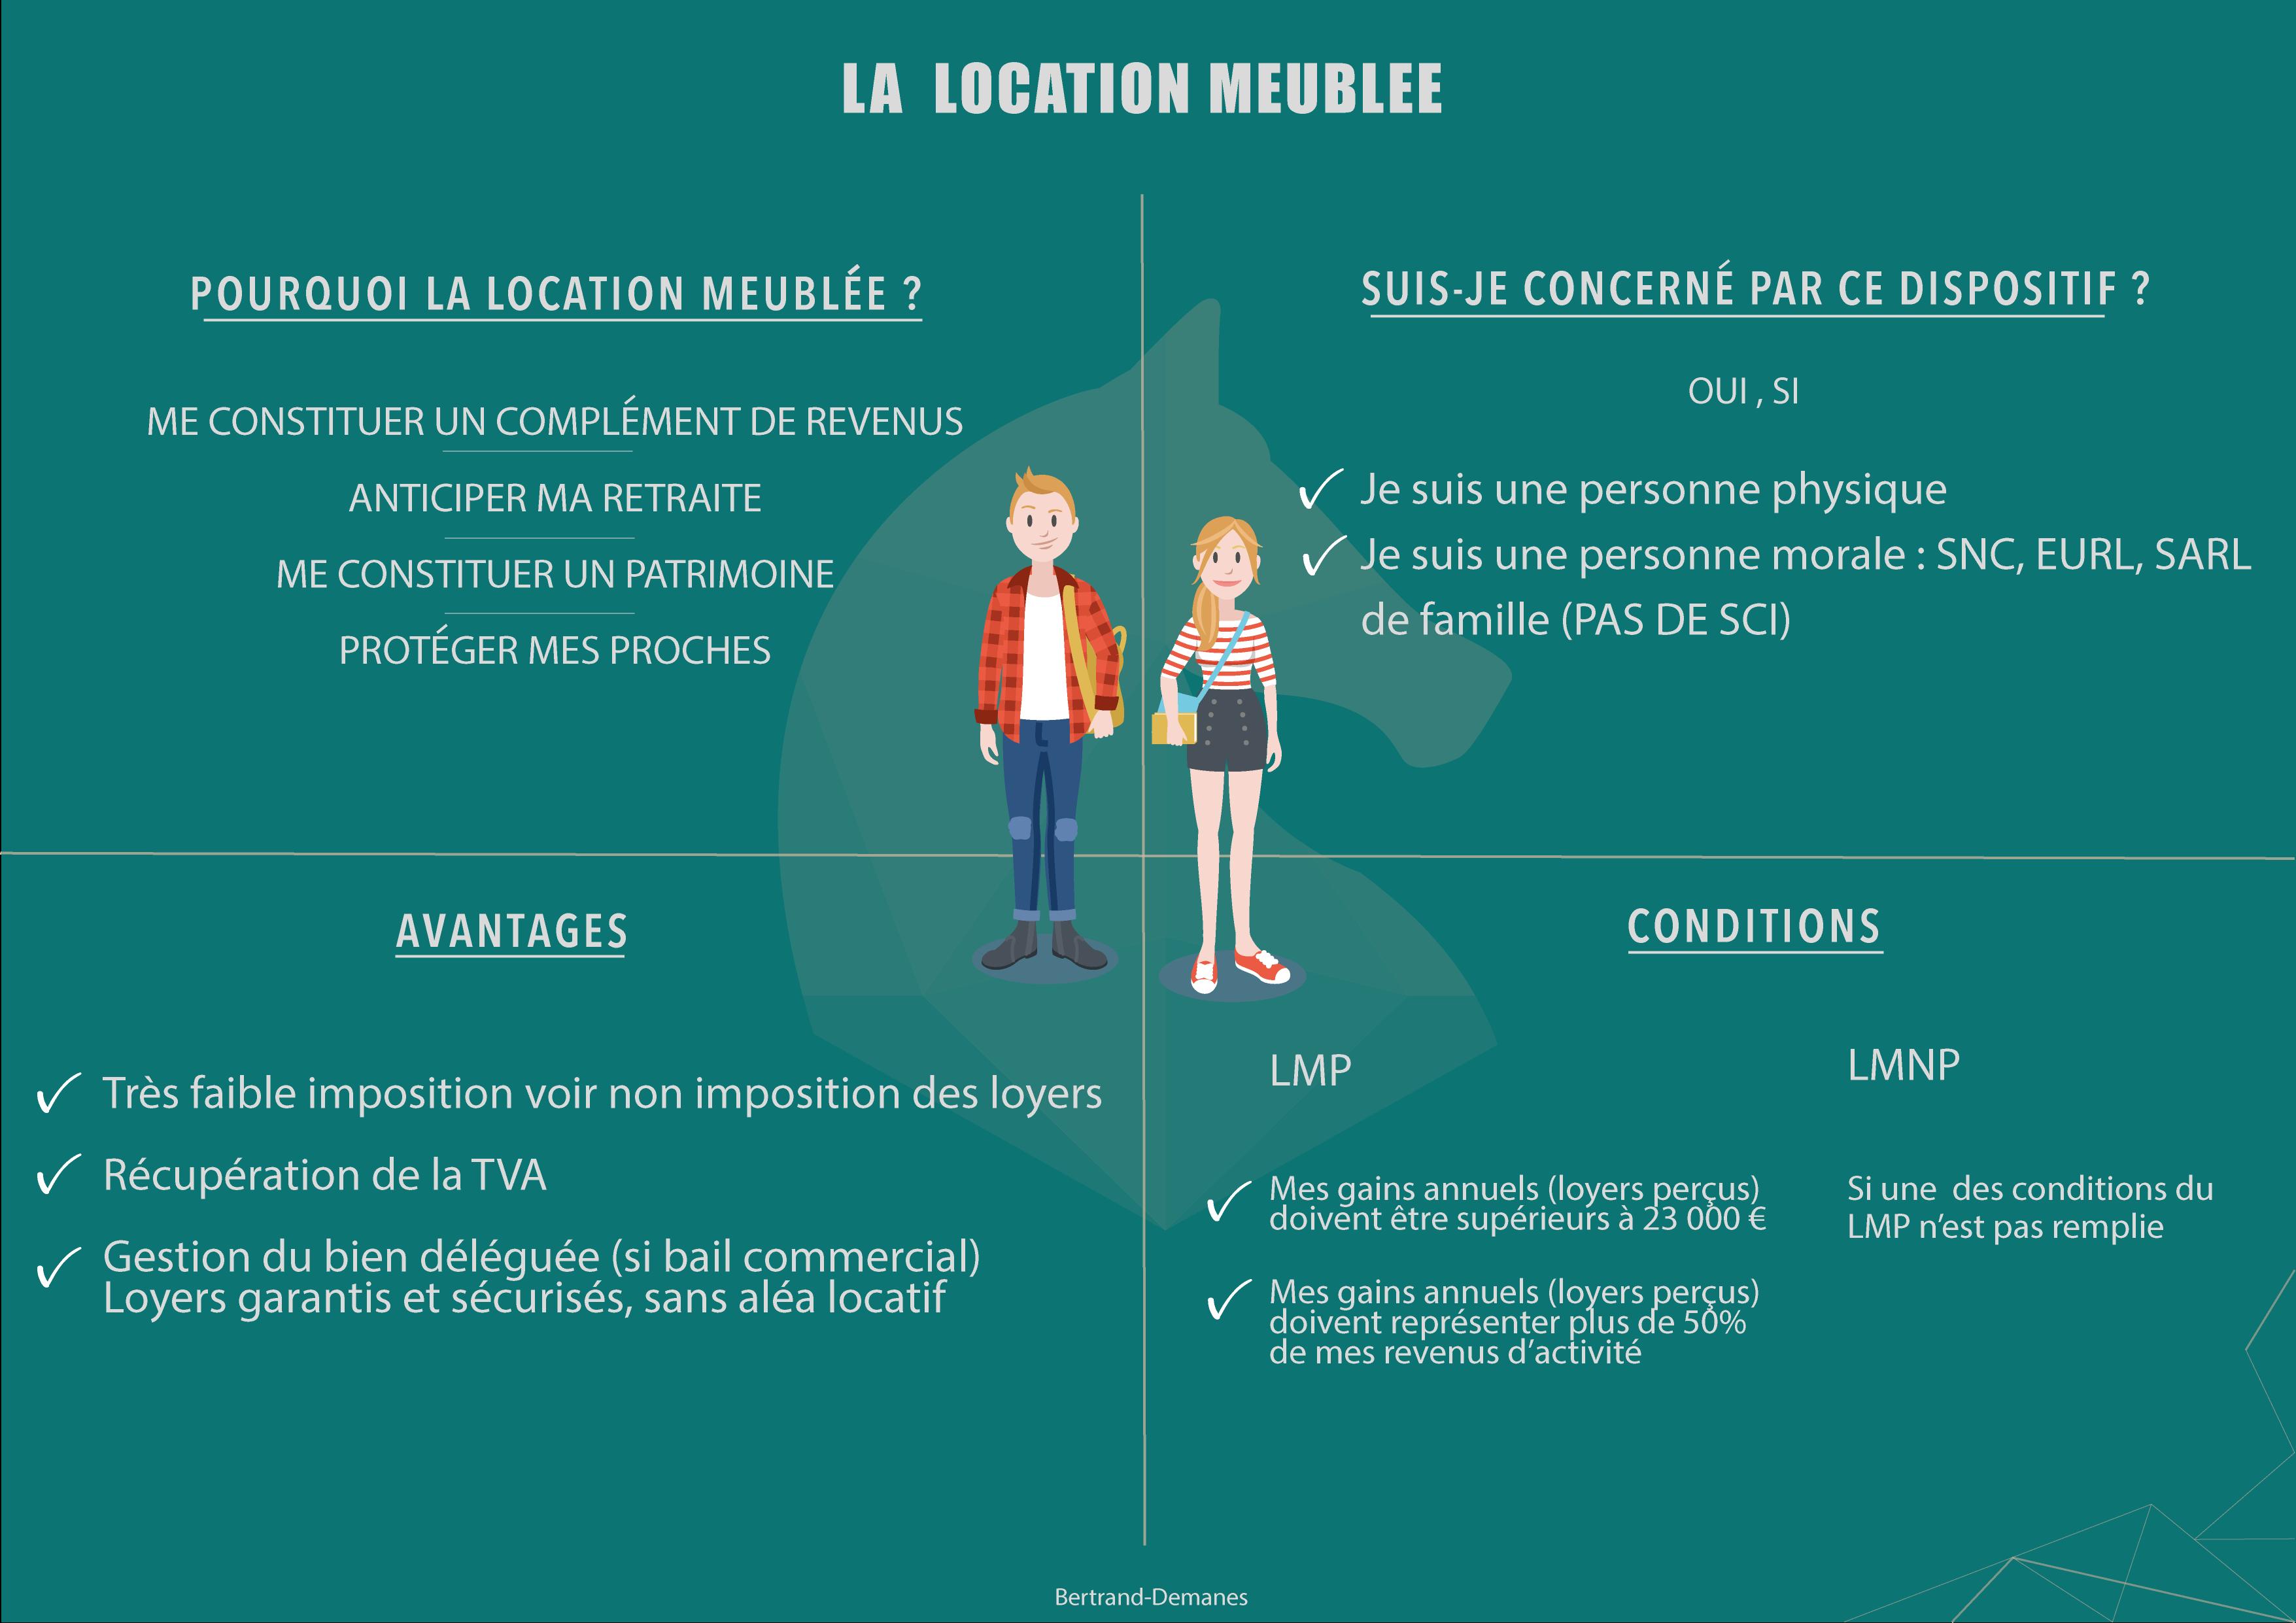 infographie-location-meublee-nantes-bertrand-demanes